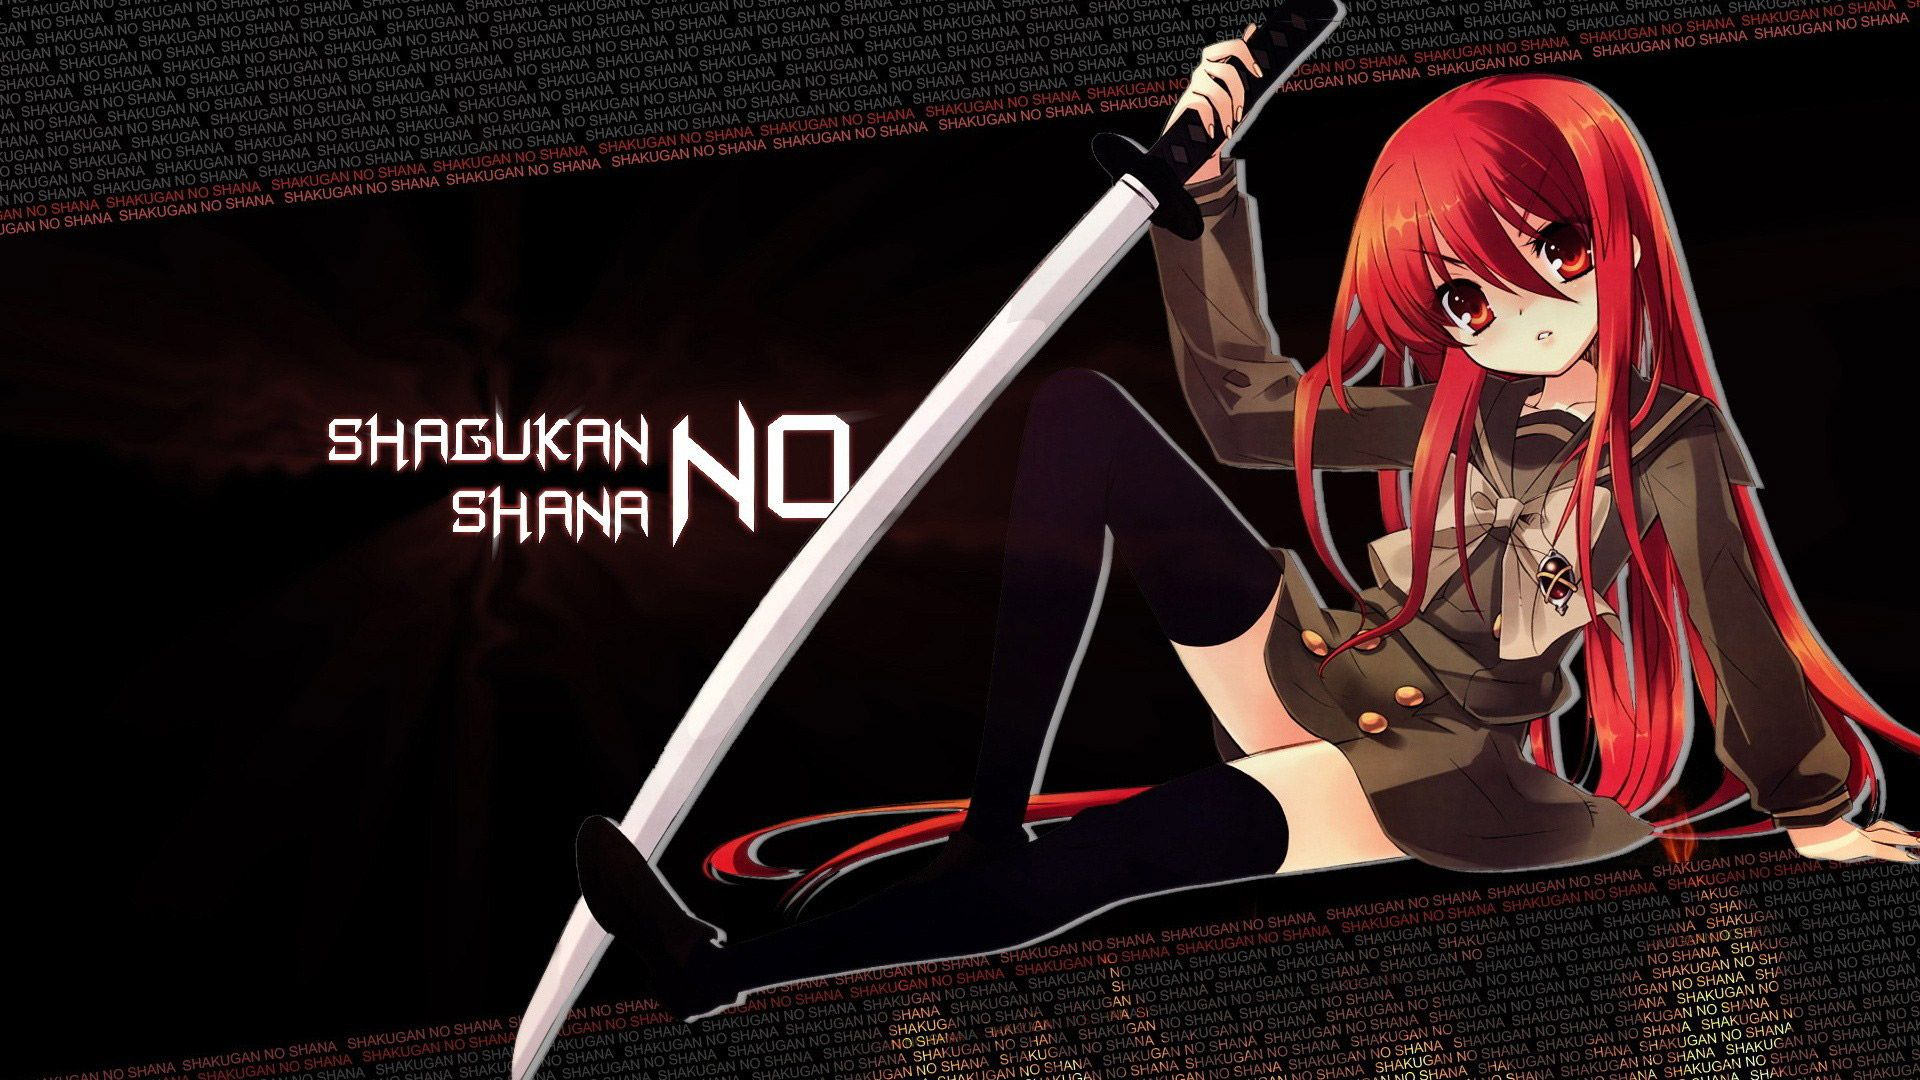 Live Anime Wallpaper for Laptop 1920×1080 Anime Wallpapers